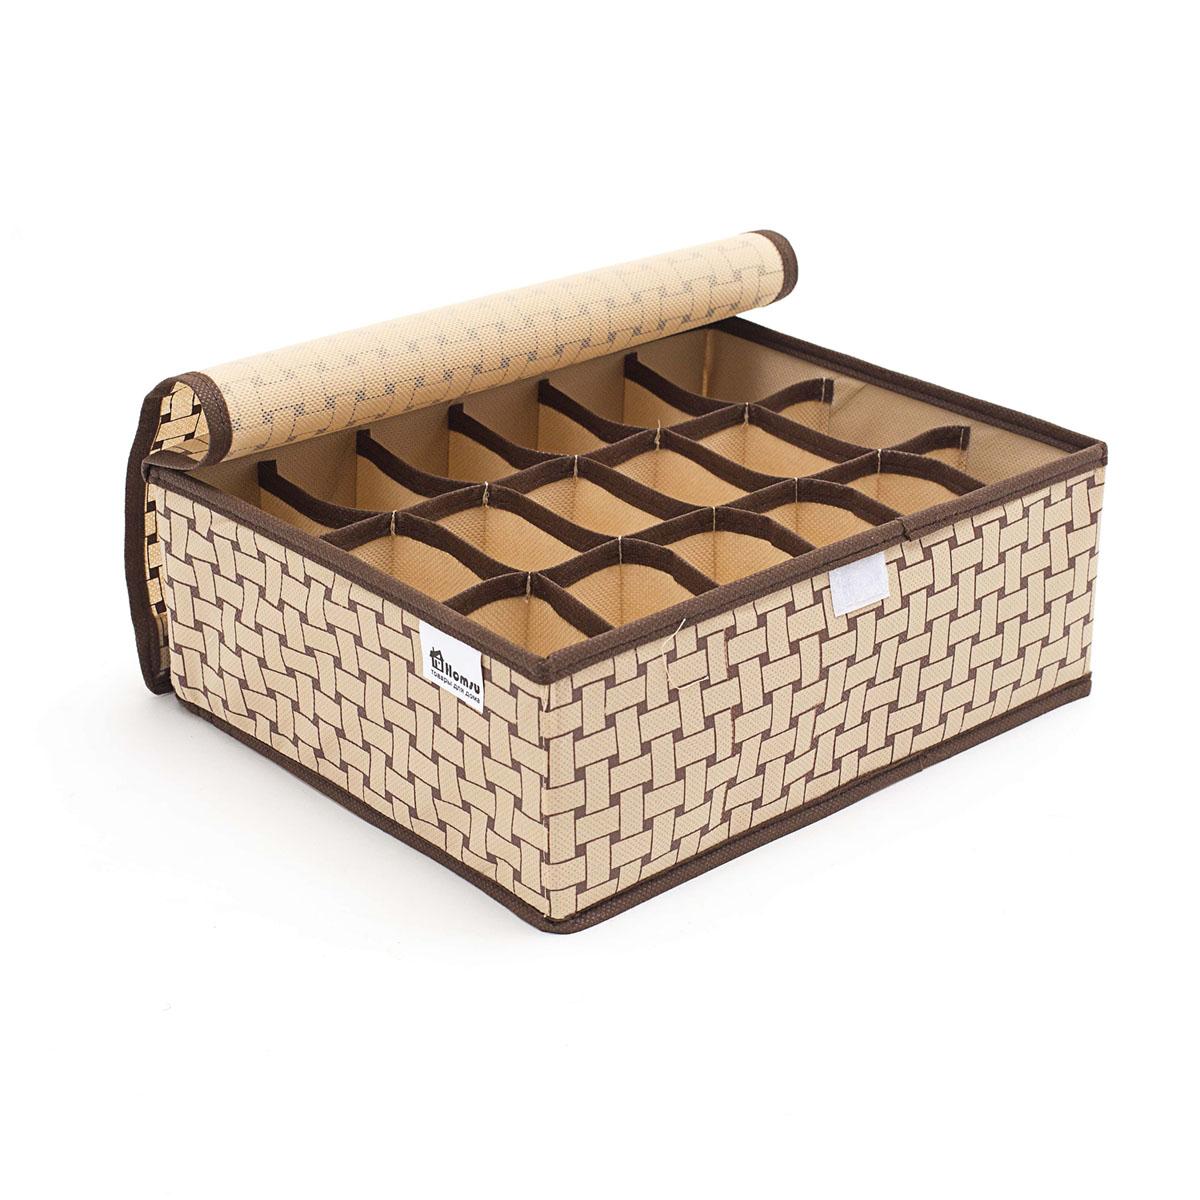 Органайзер для хранения вещей Homsu Pletenka, 18 секций, 31 х 24 х 11 см набор органайзеров homsu ностальгия с крышкой 31 х 24 х 11 см 3 шт